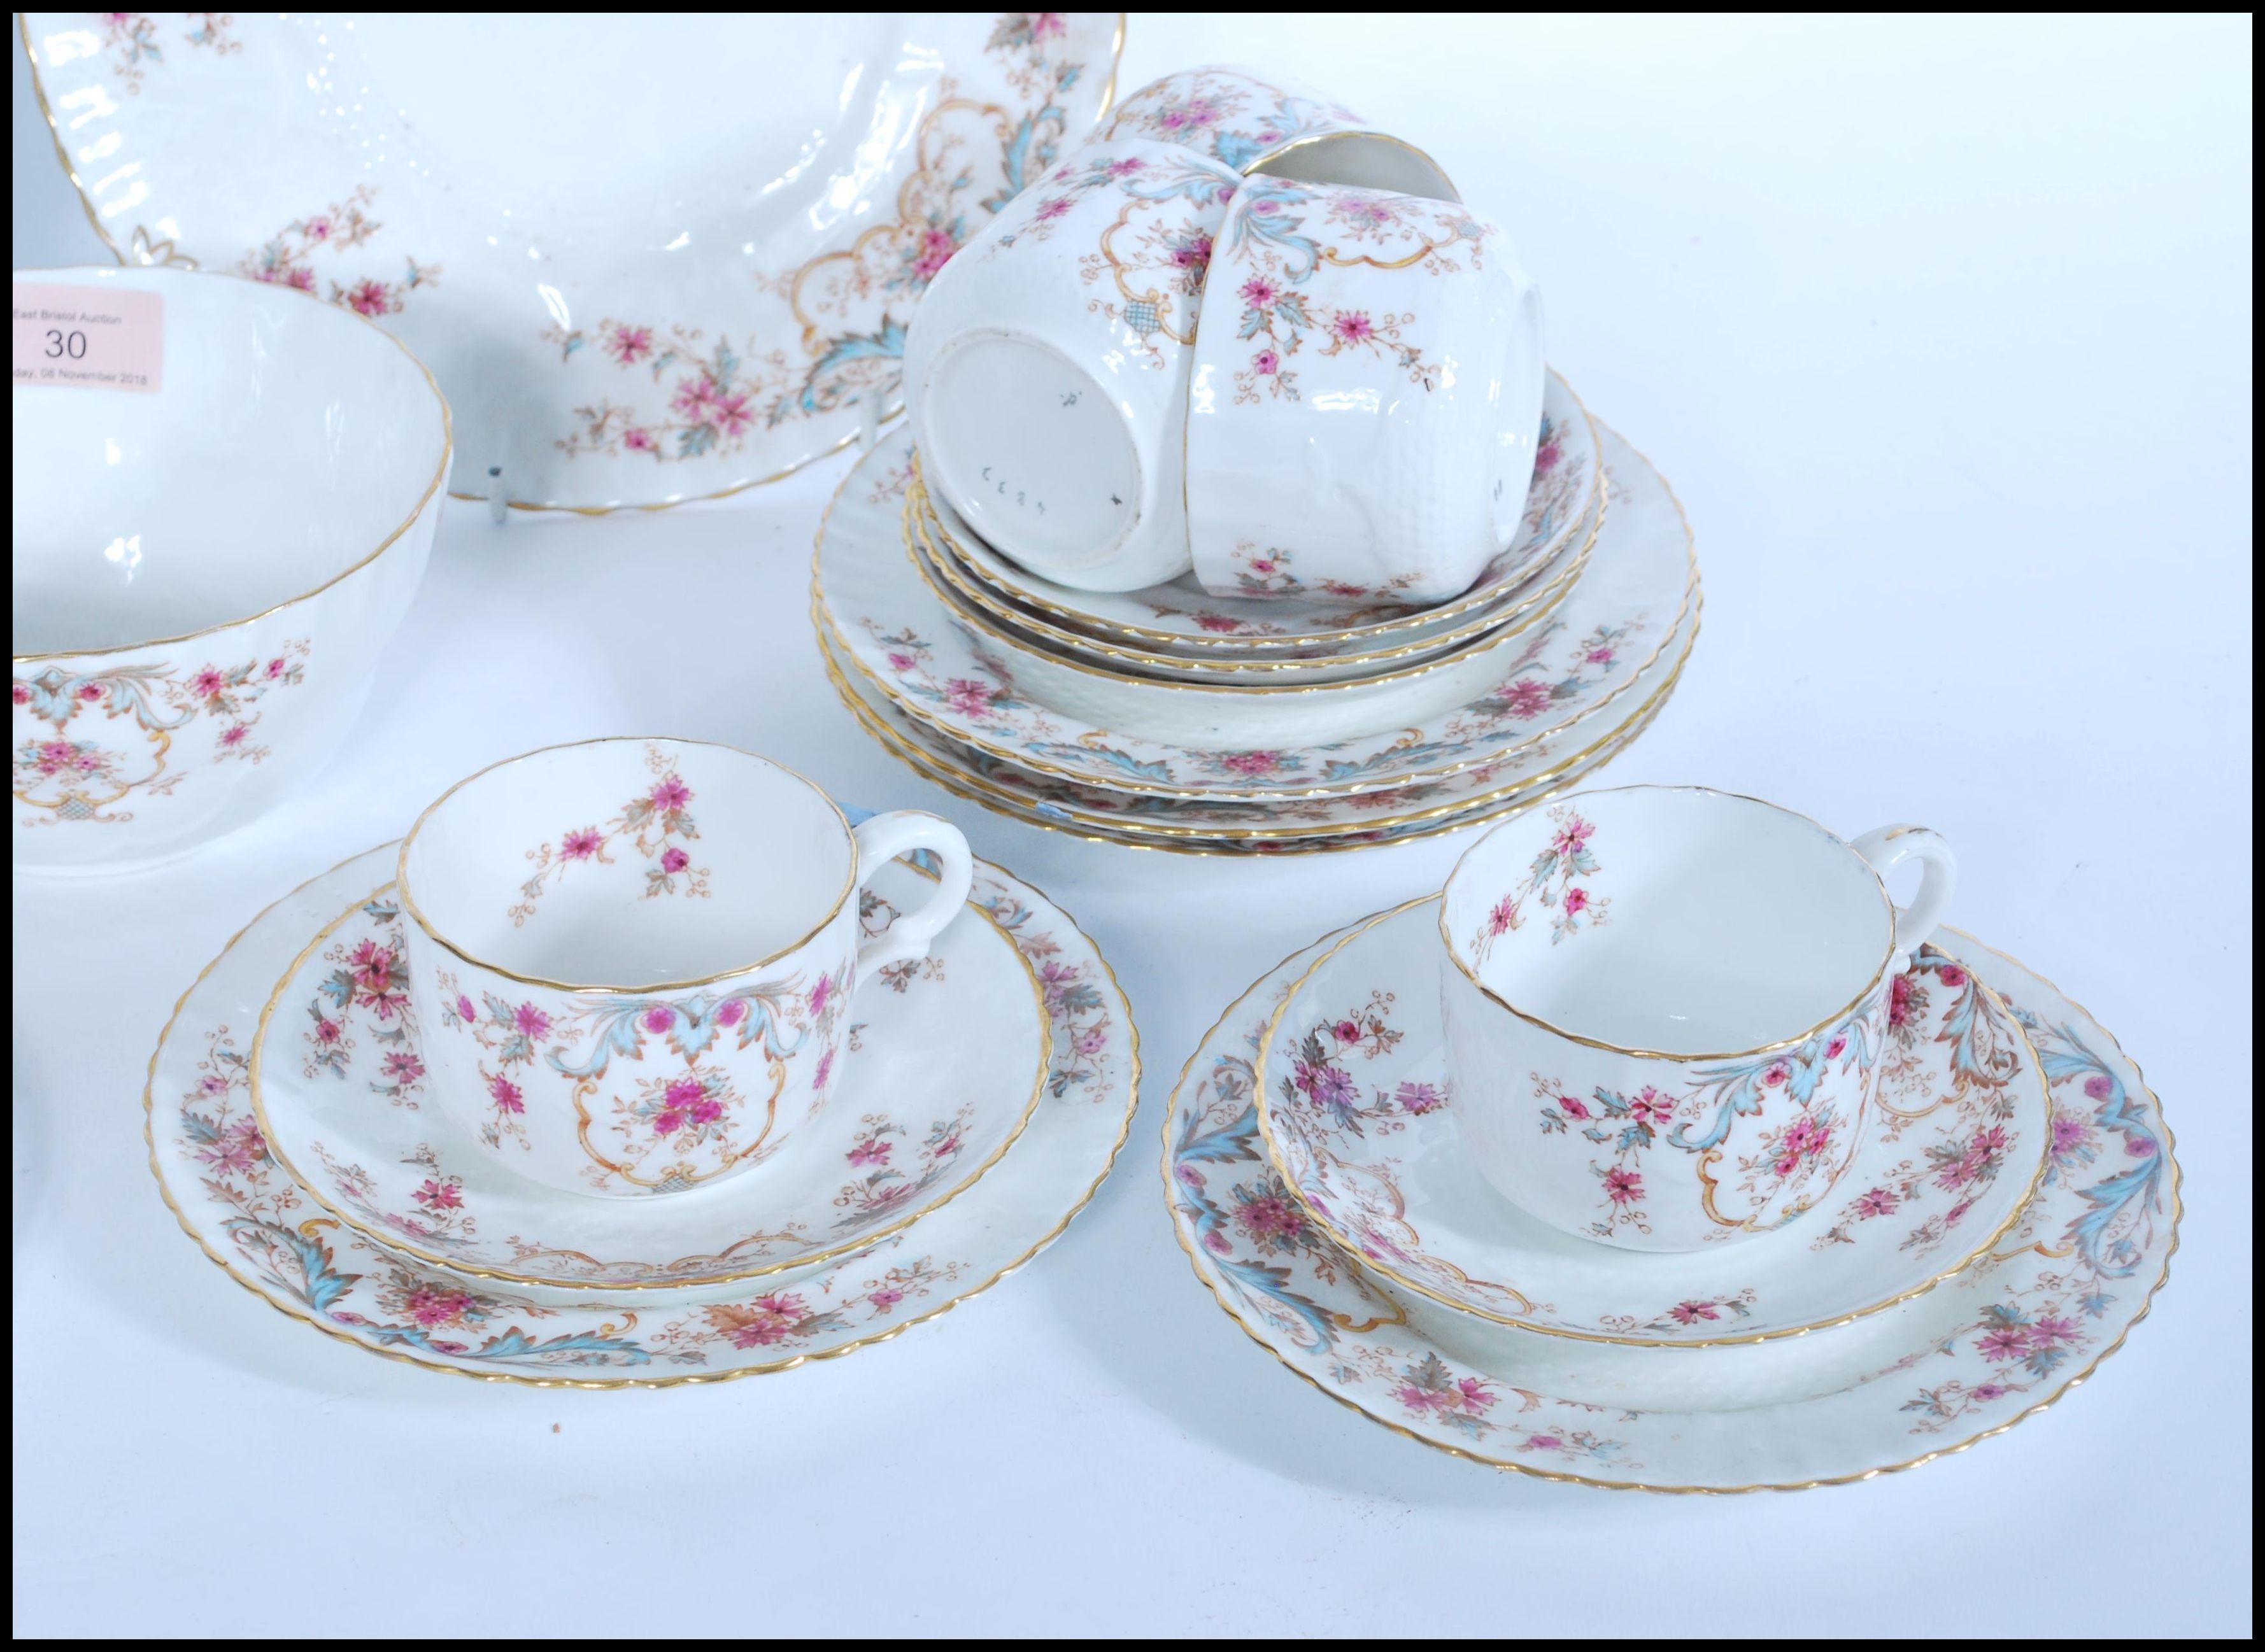 Lot 30 - A 19th century Victorian William Alsager Adderley & Co ' Spray ' Pattern china tea service